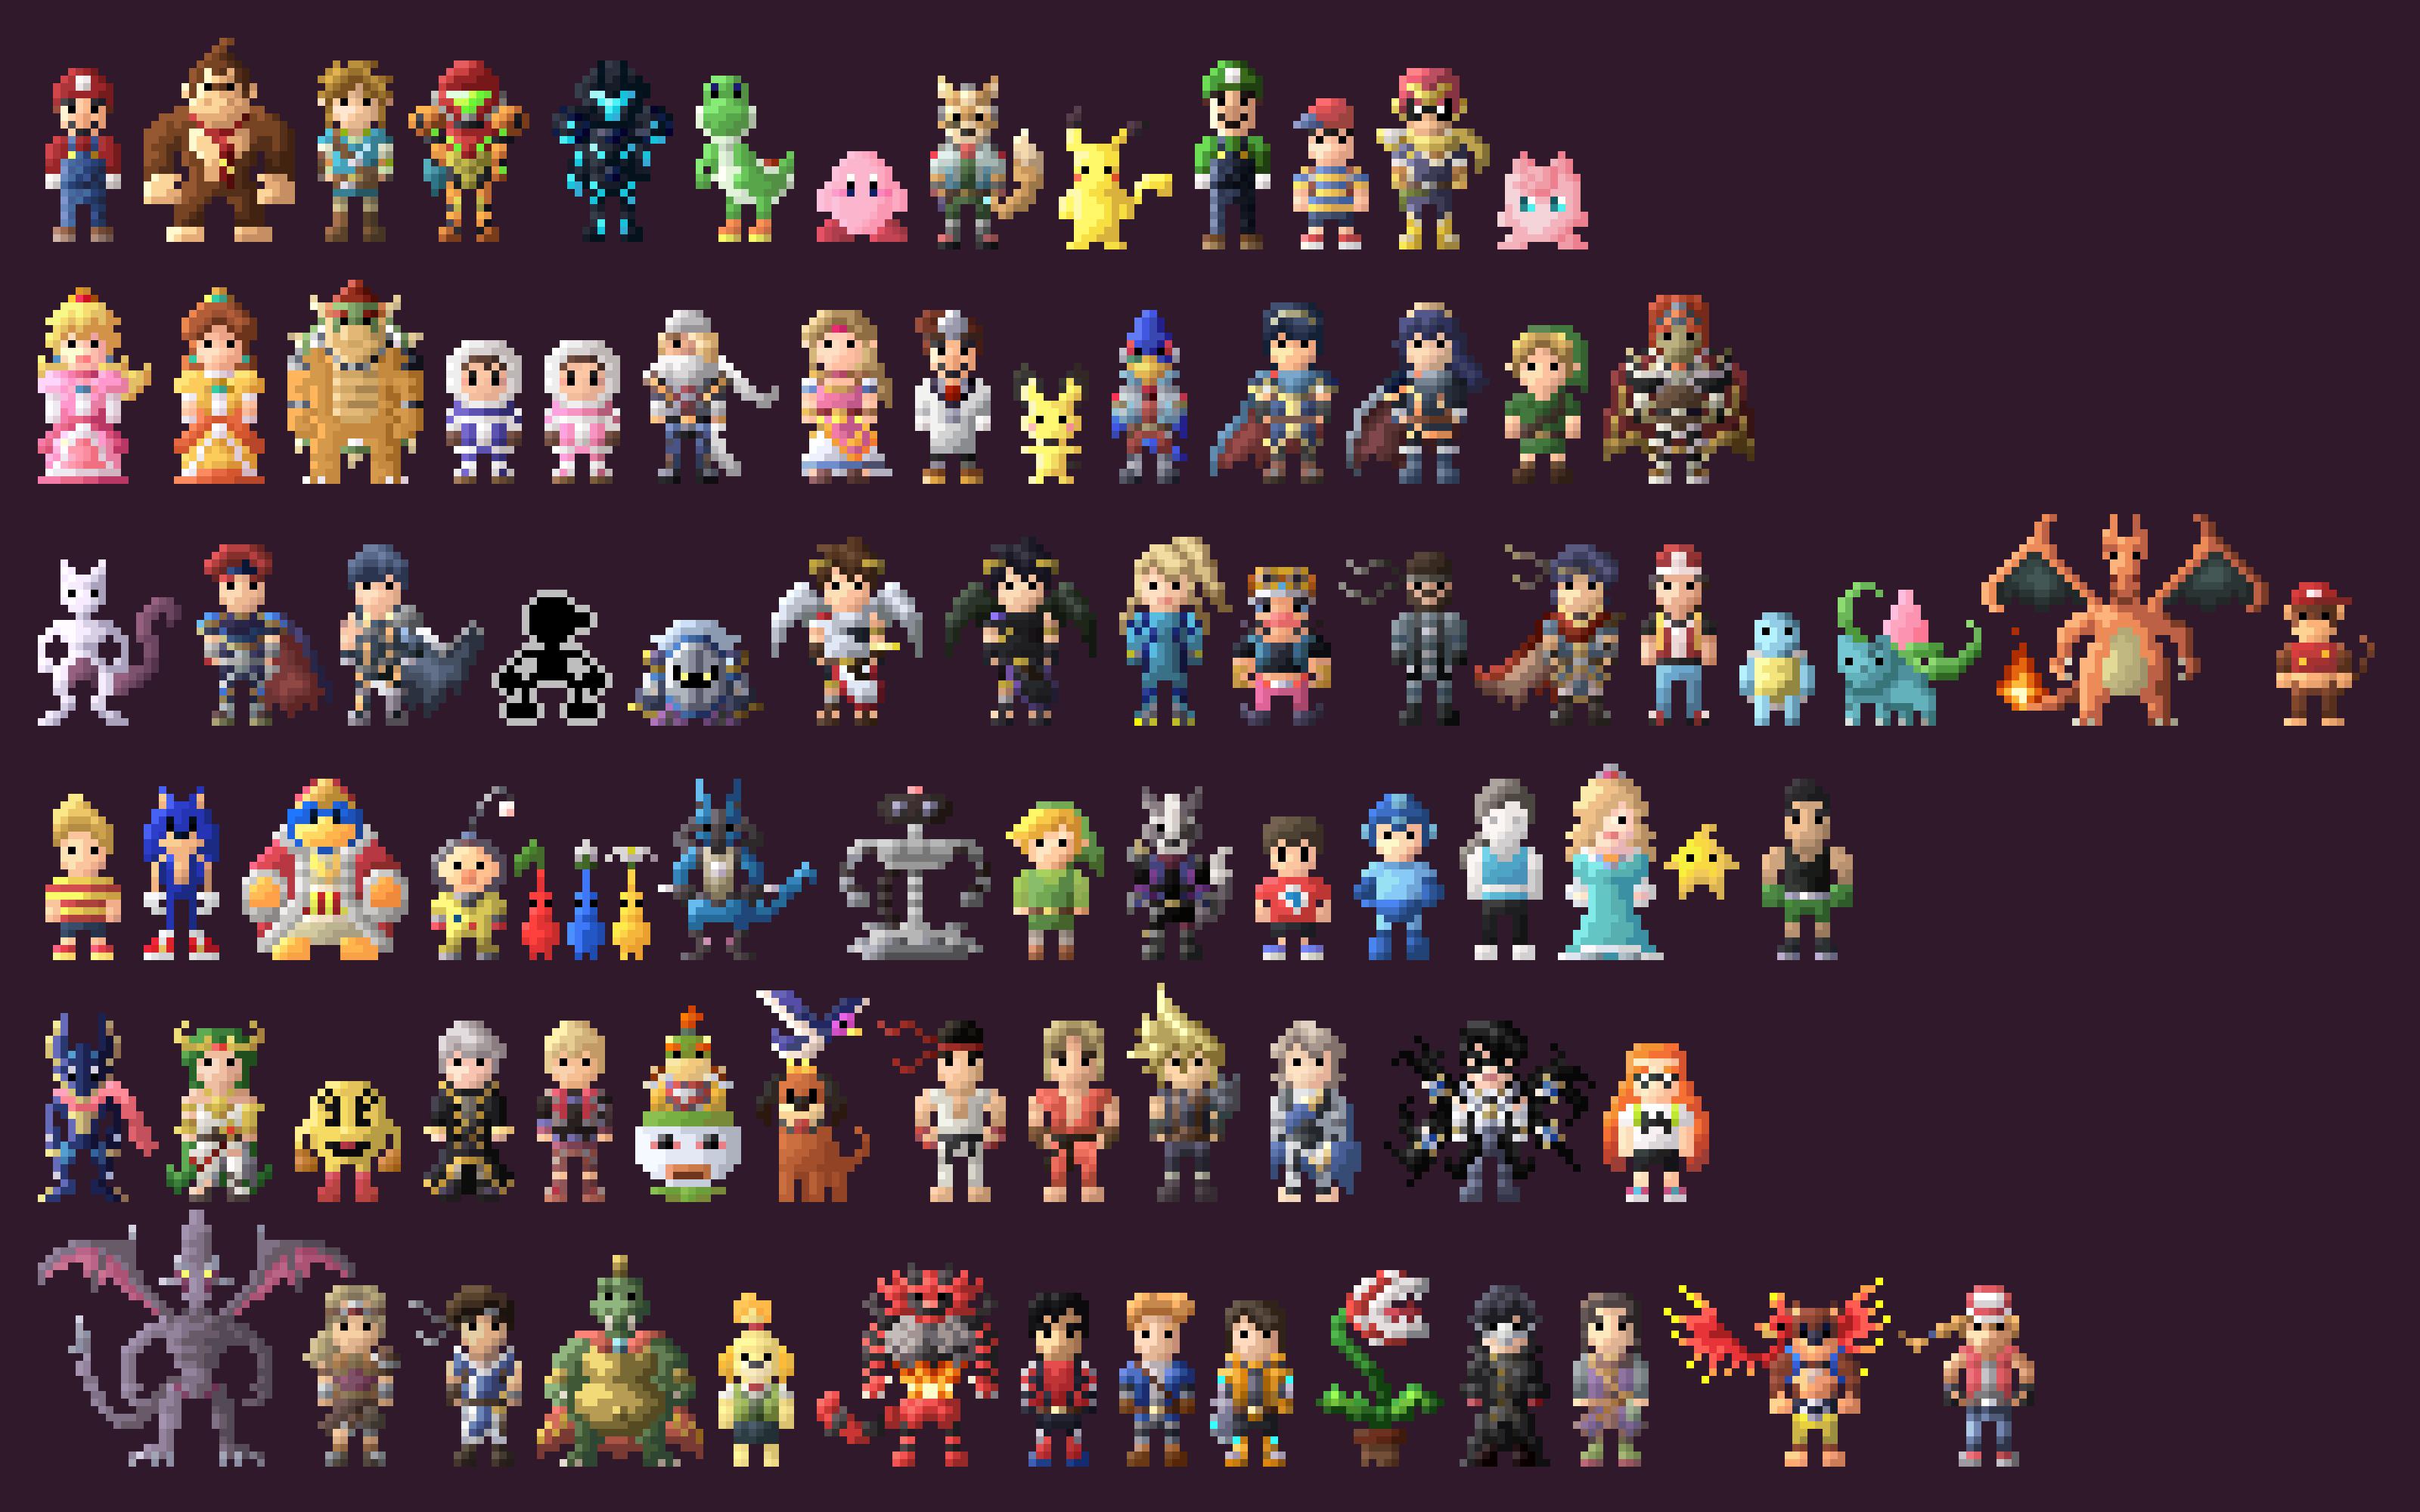 mario bros characters 8 bit